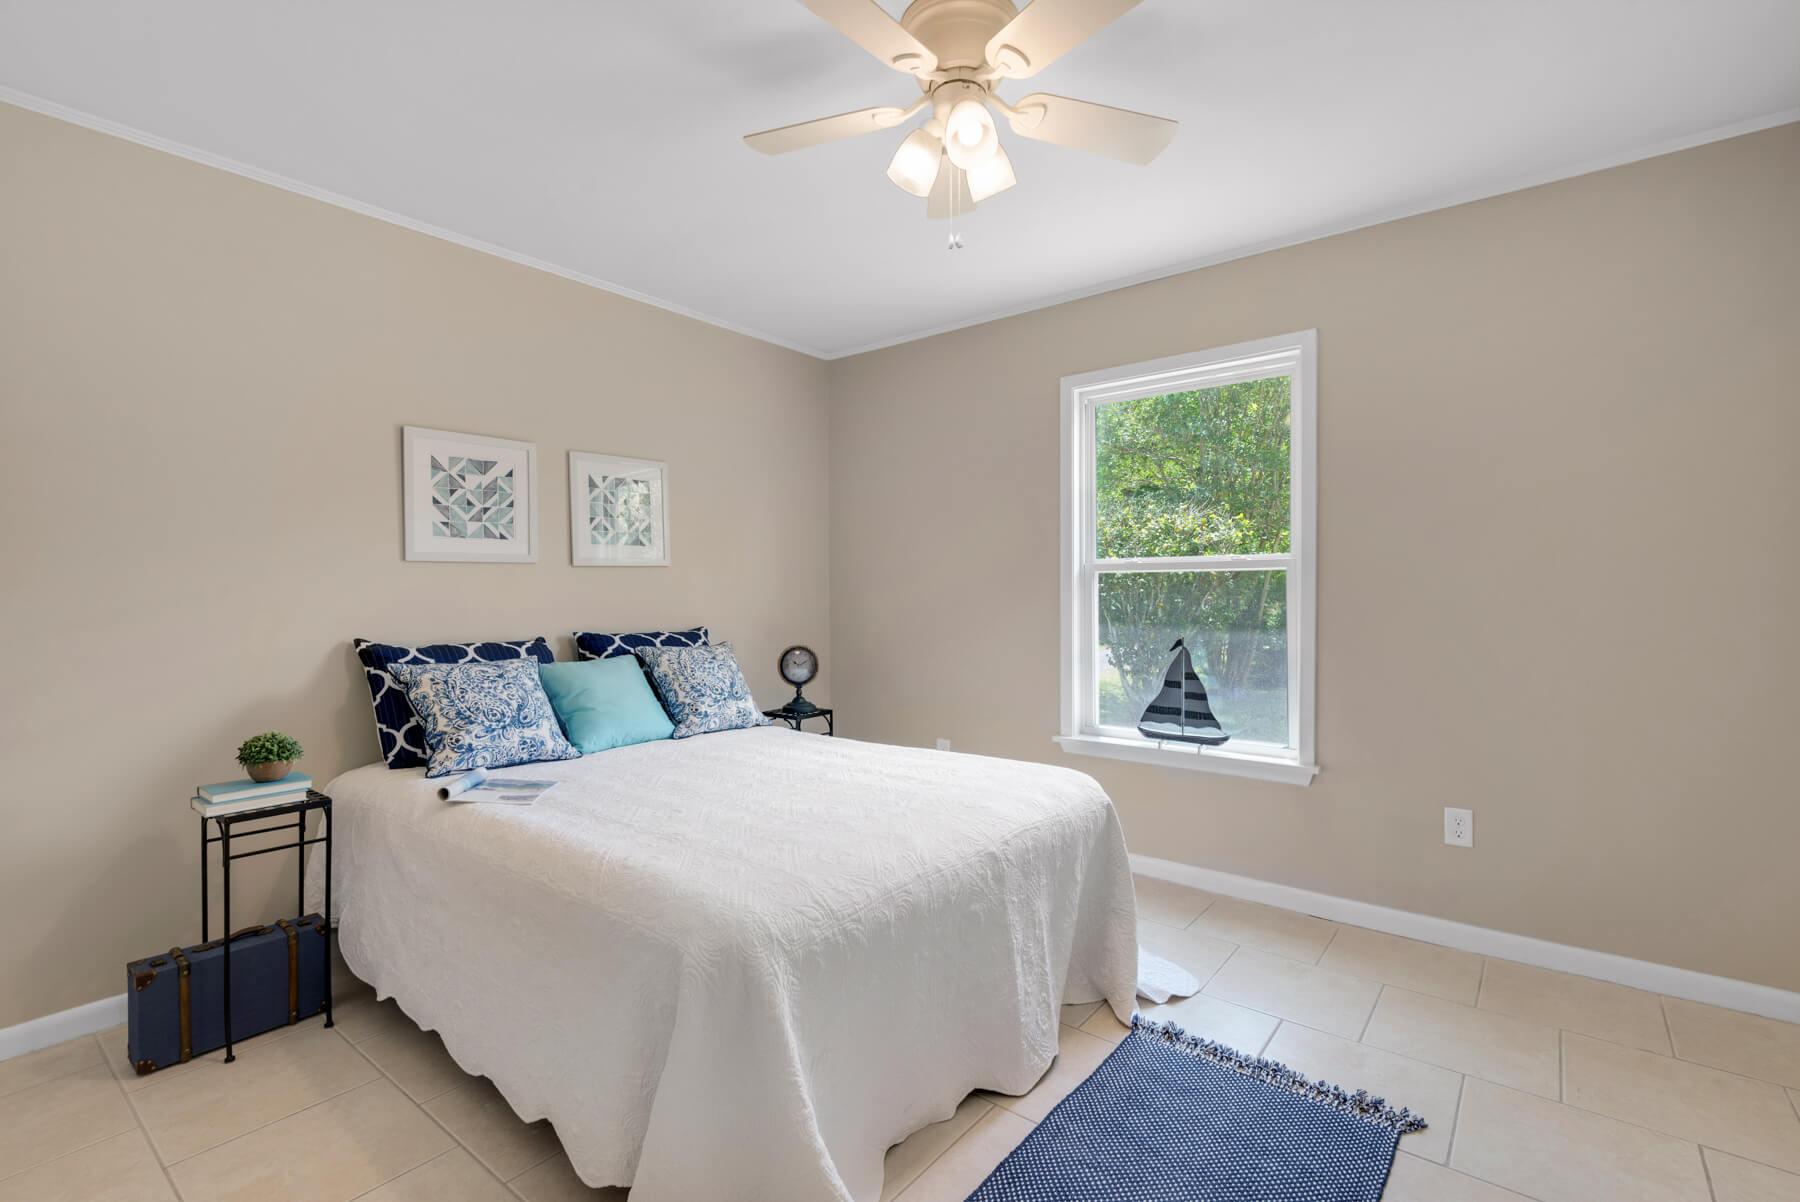 7466 Twin Beech Road Fairhope for Sale Urban Property bedroom view 1